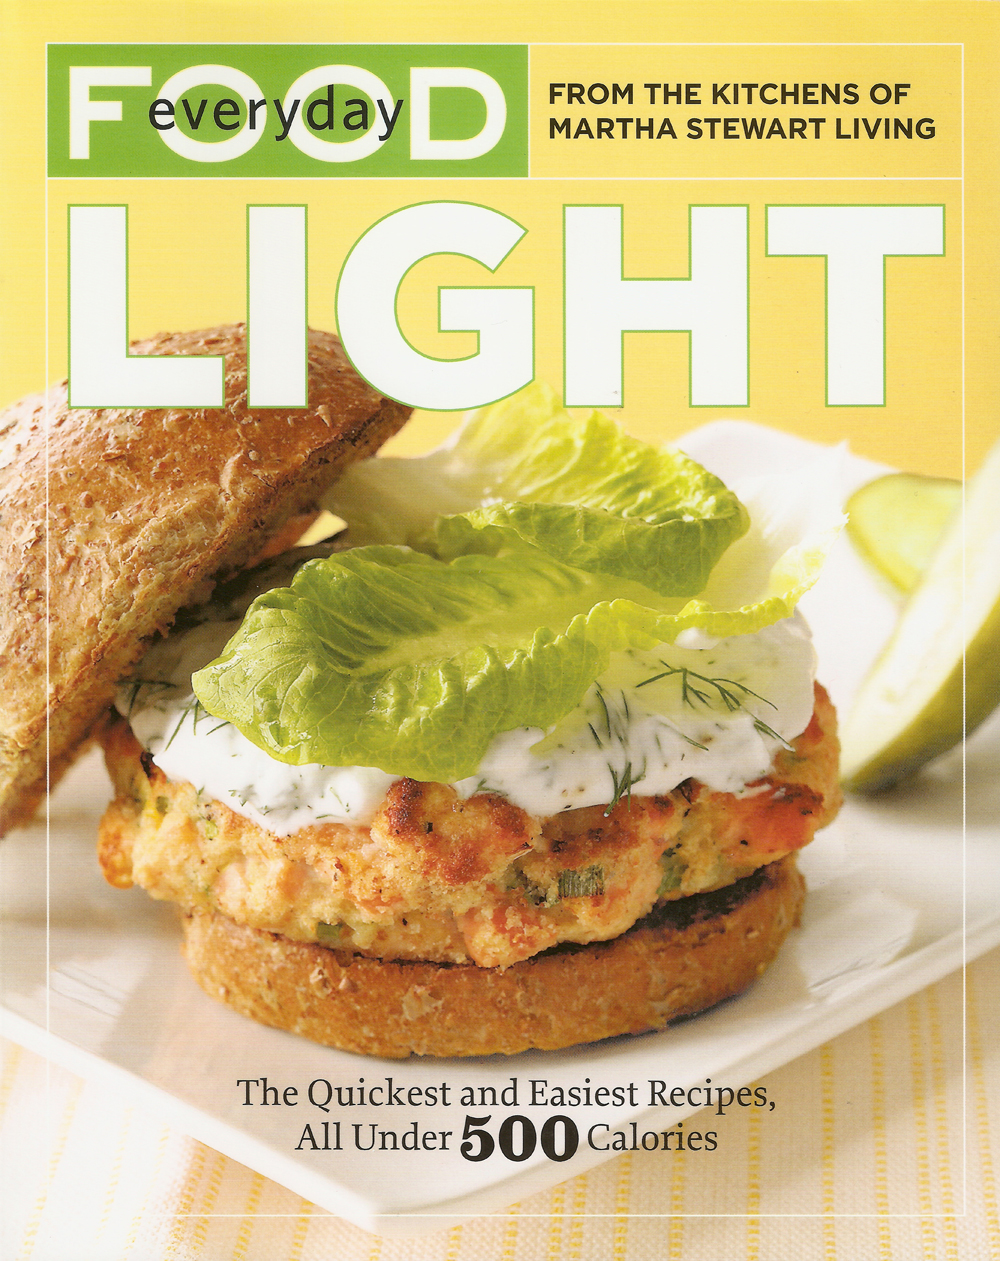 Salmon Burgers with Yogurt-Dill Sauce (Low fat)